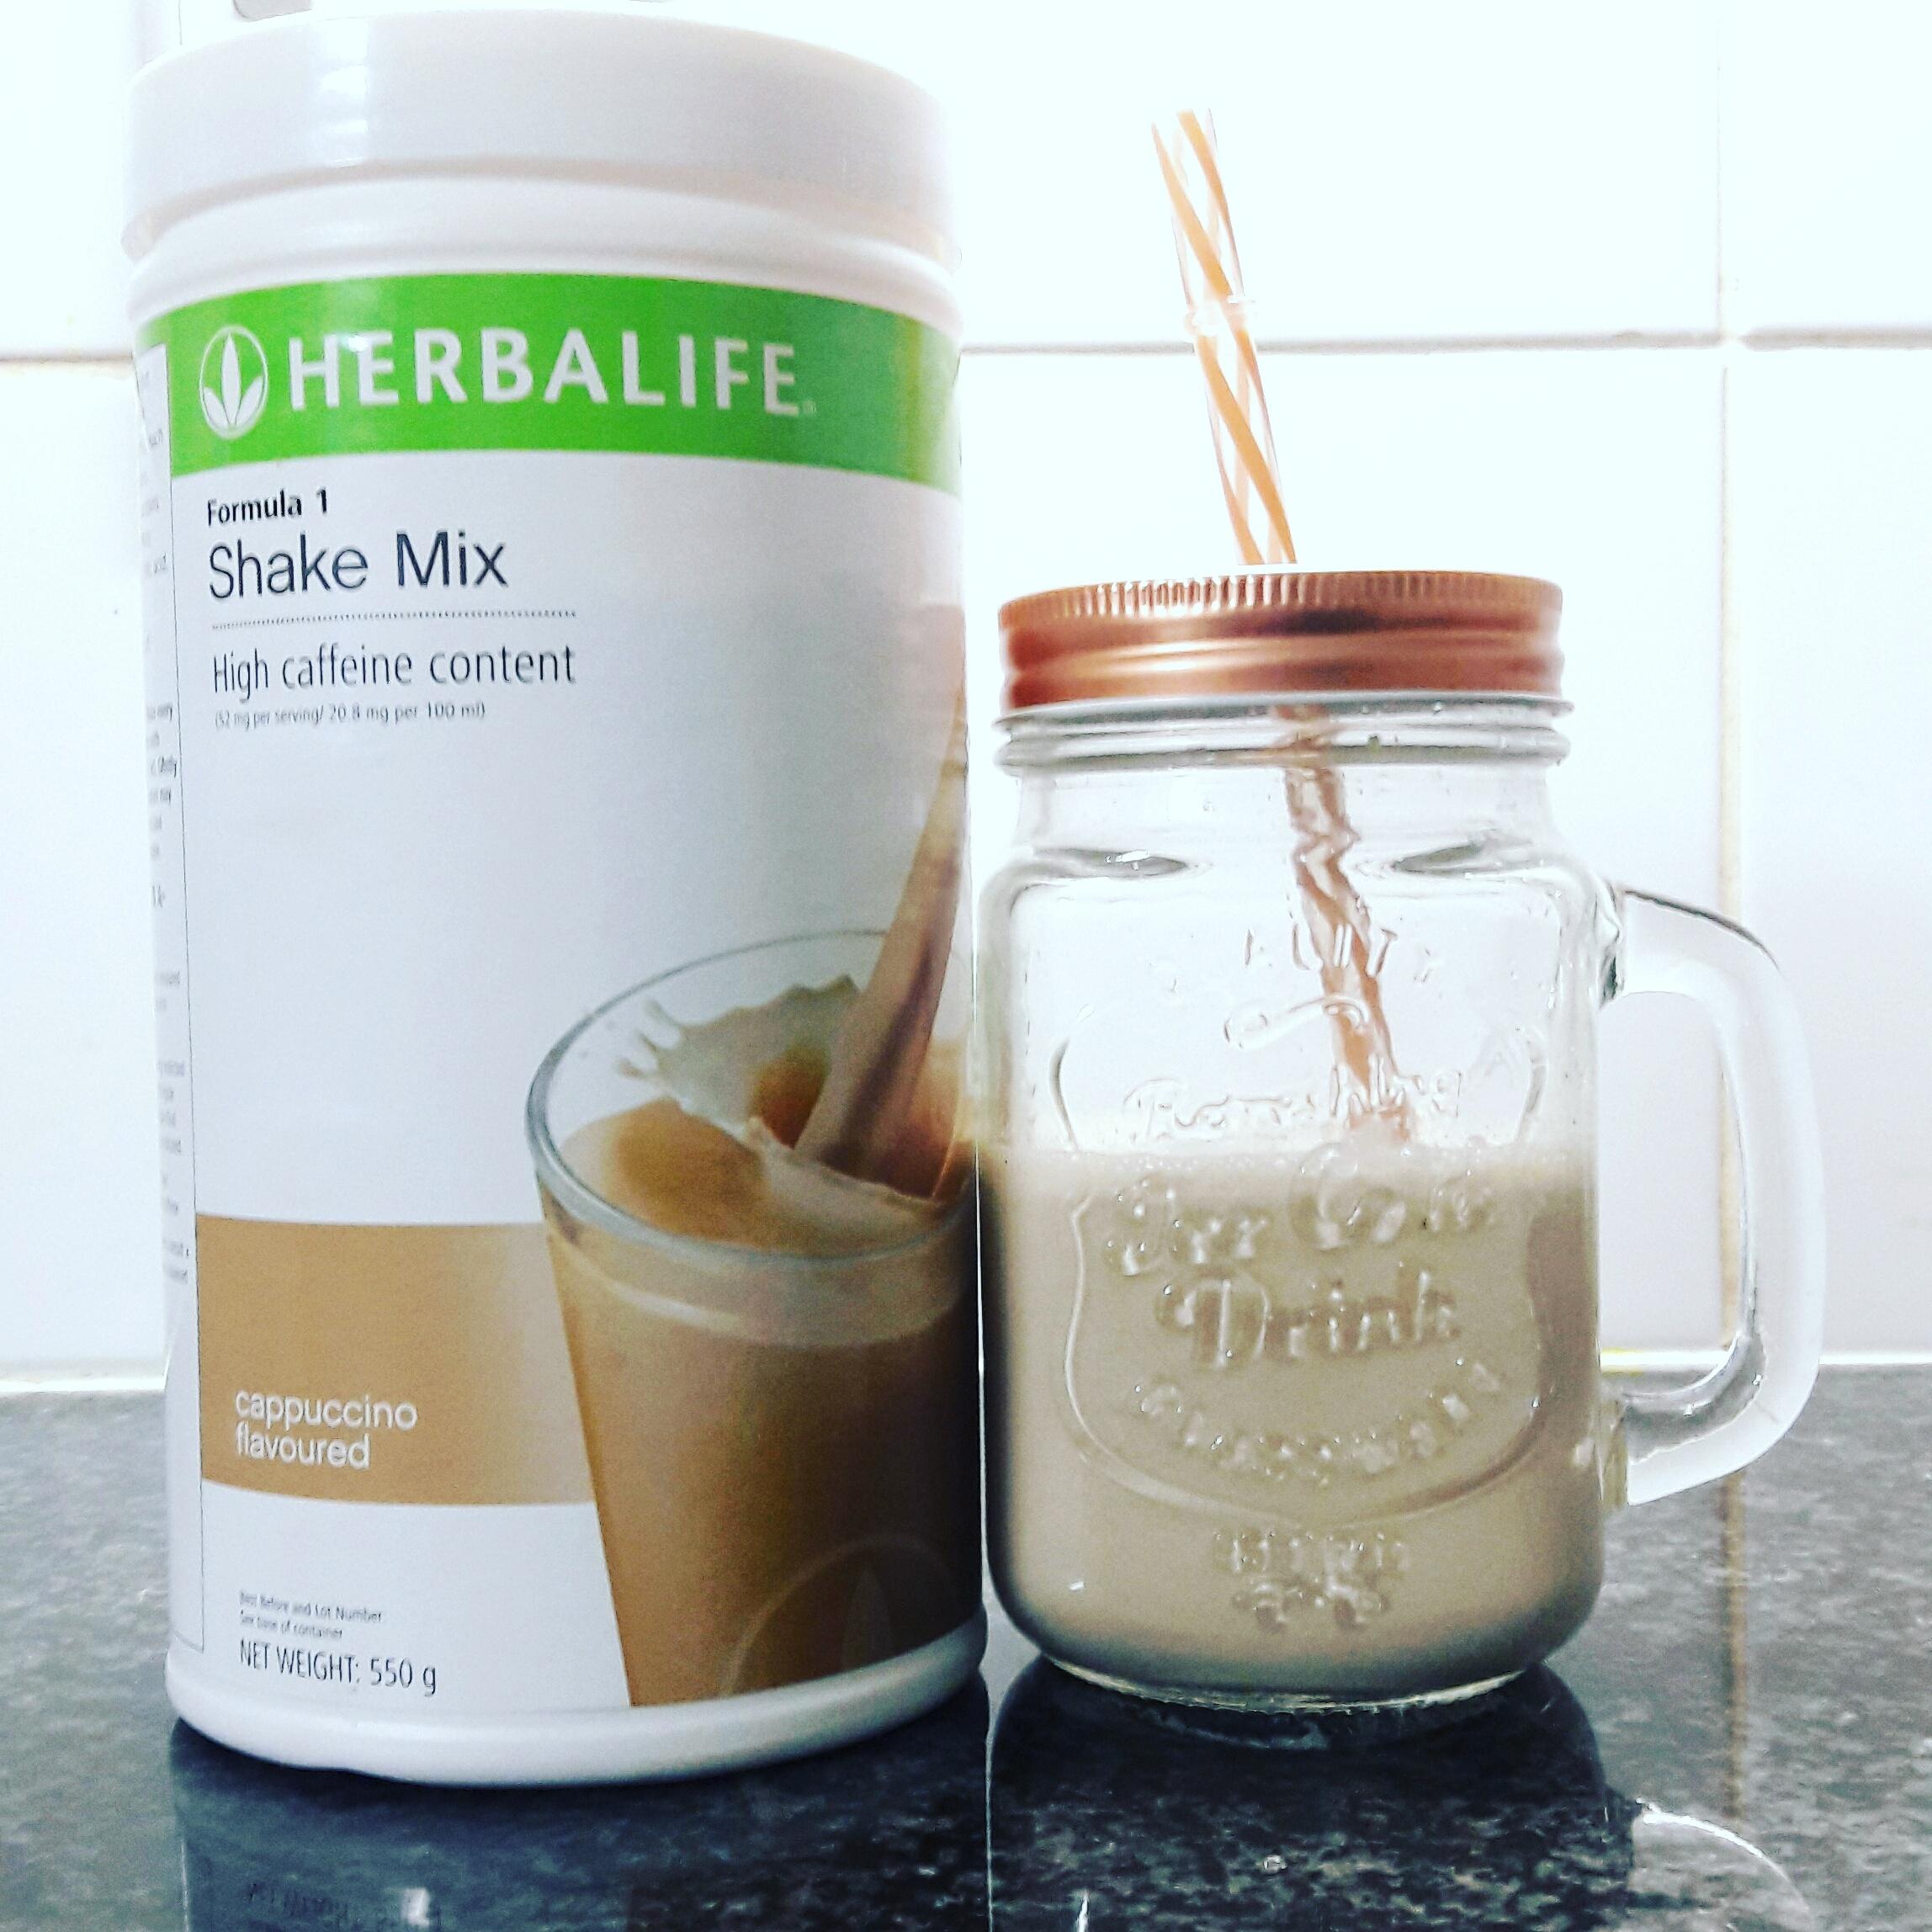 The New Herbalife Formula 1 Cappuccino Shake Mix - Life & Mo